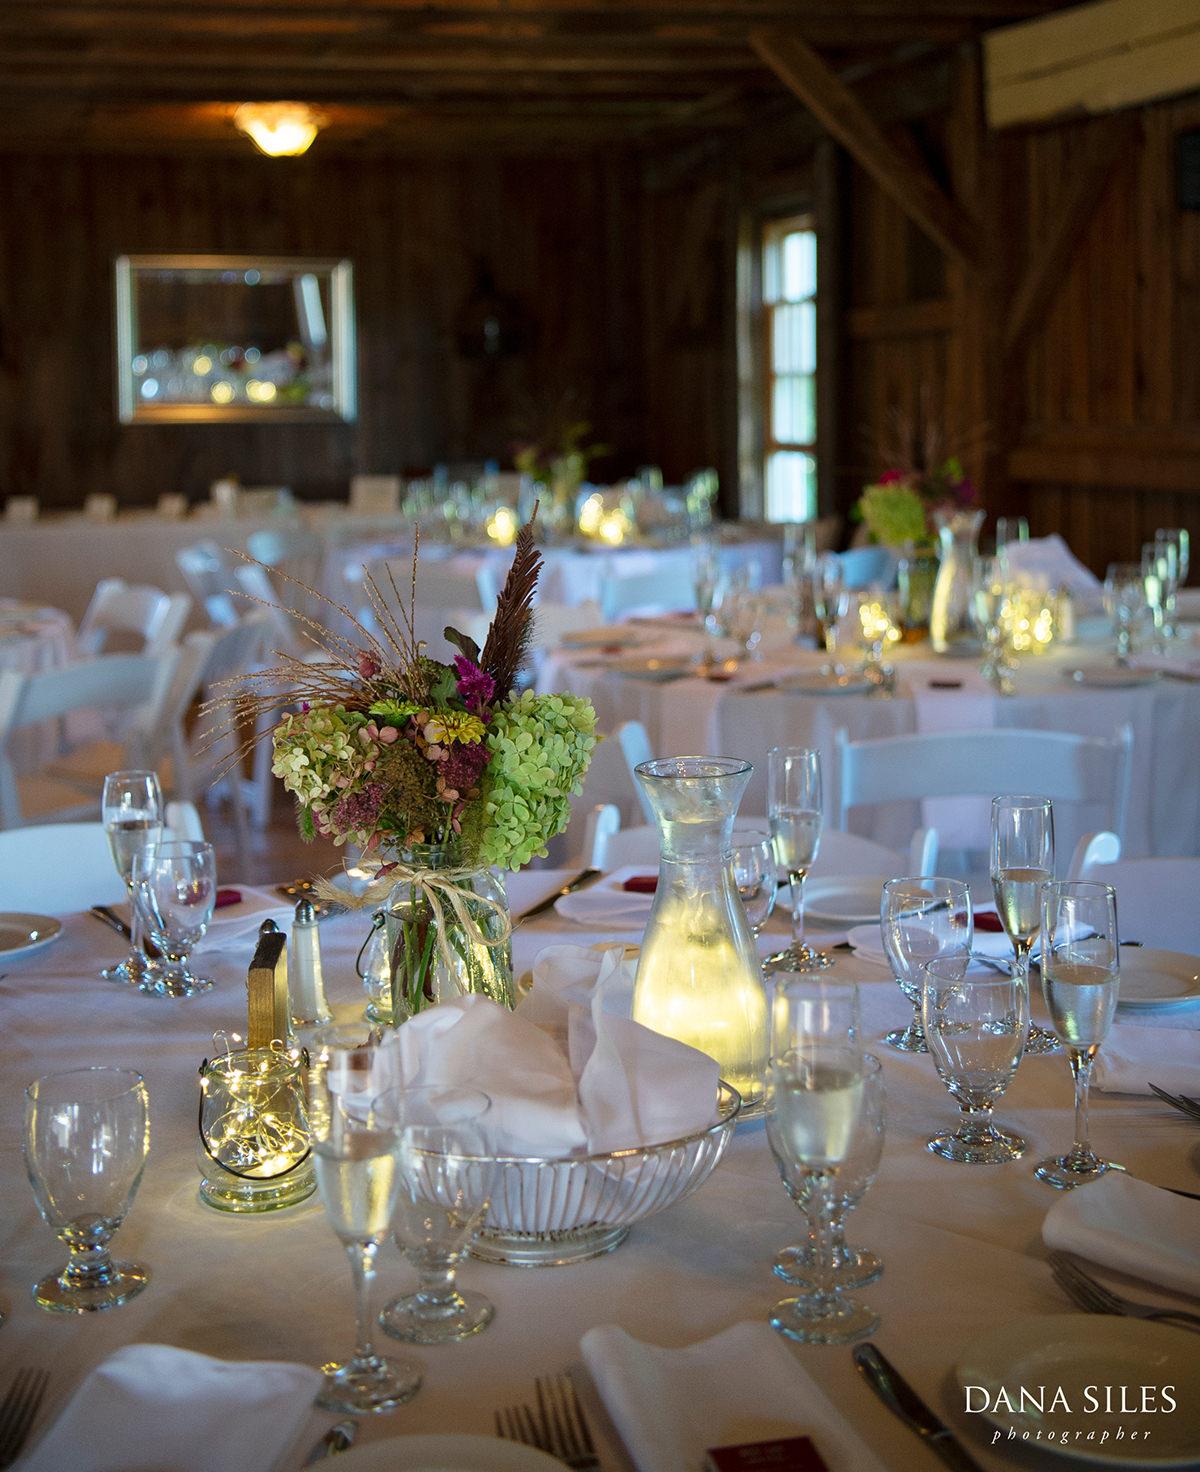 pranzi-catering-hilltop-blooms-ct-wedding